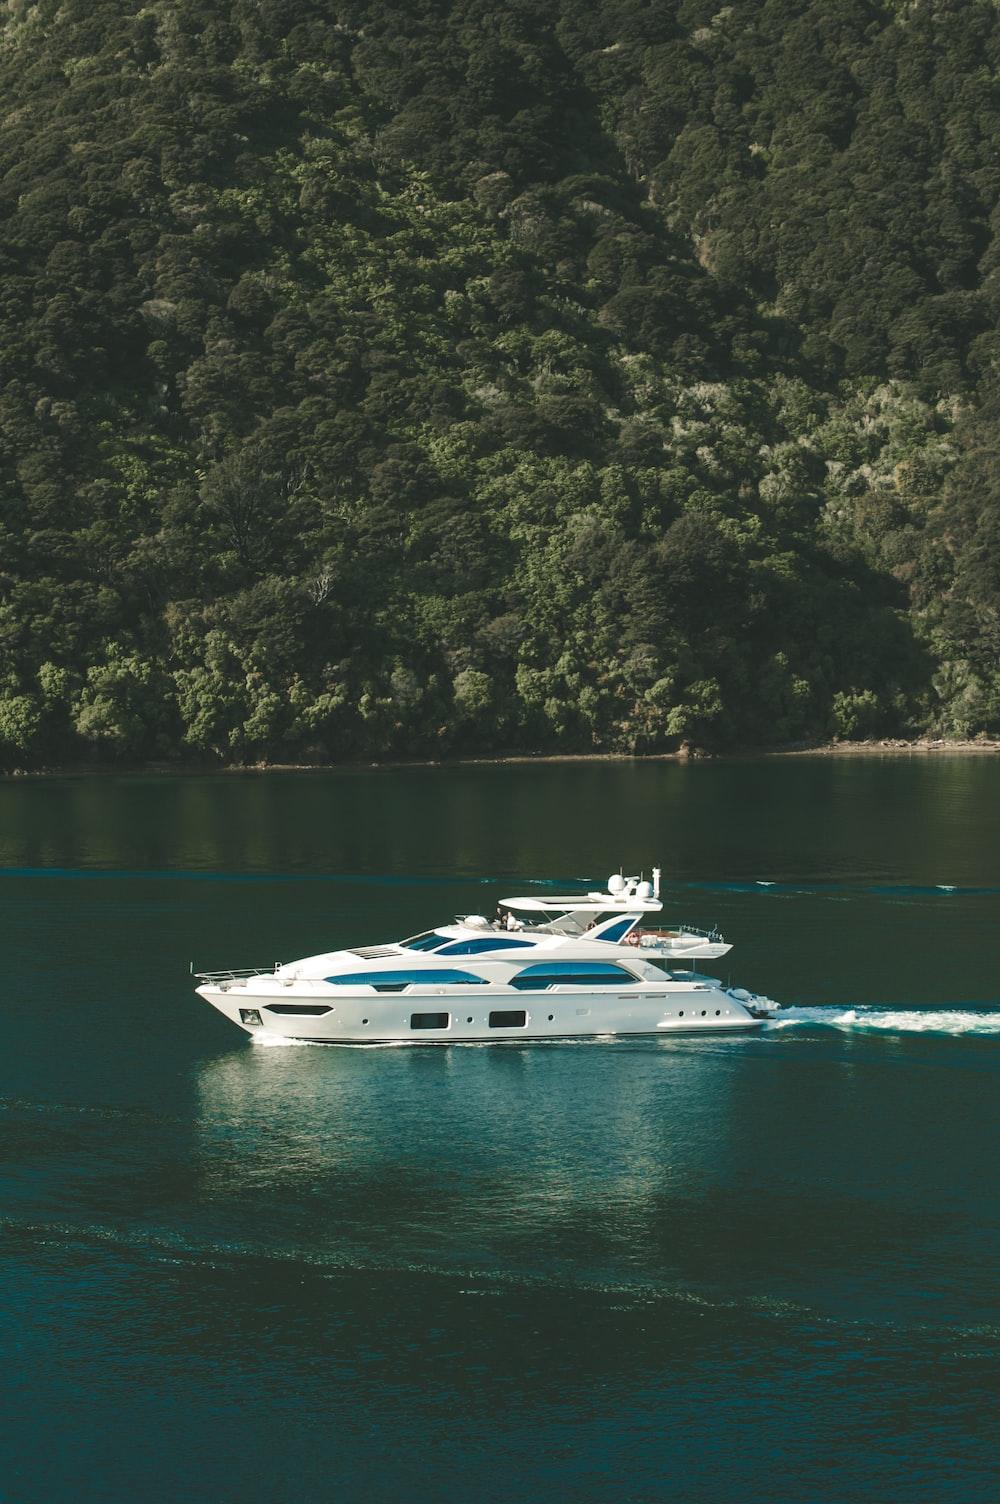 birds eye photography of yacht on body of water